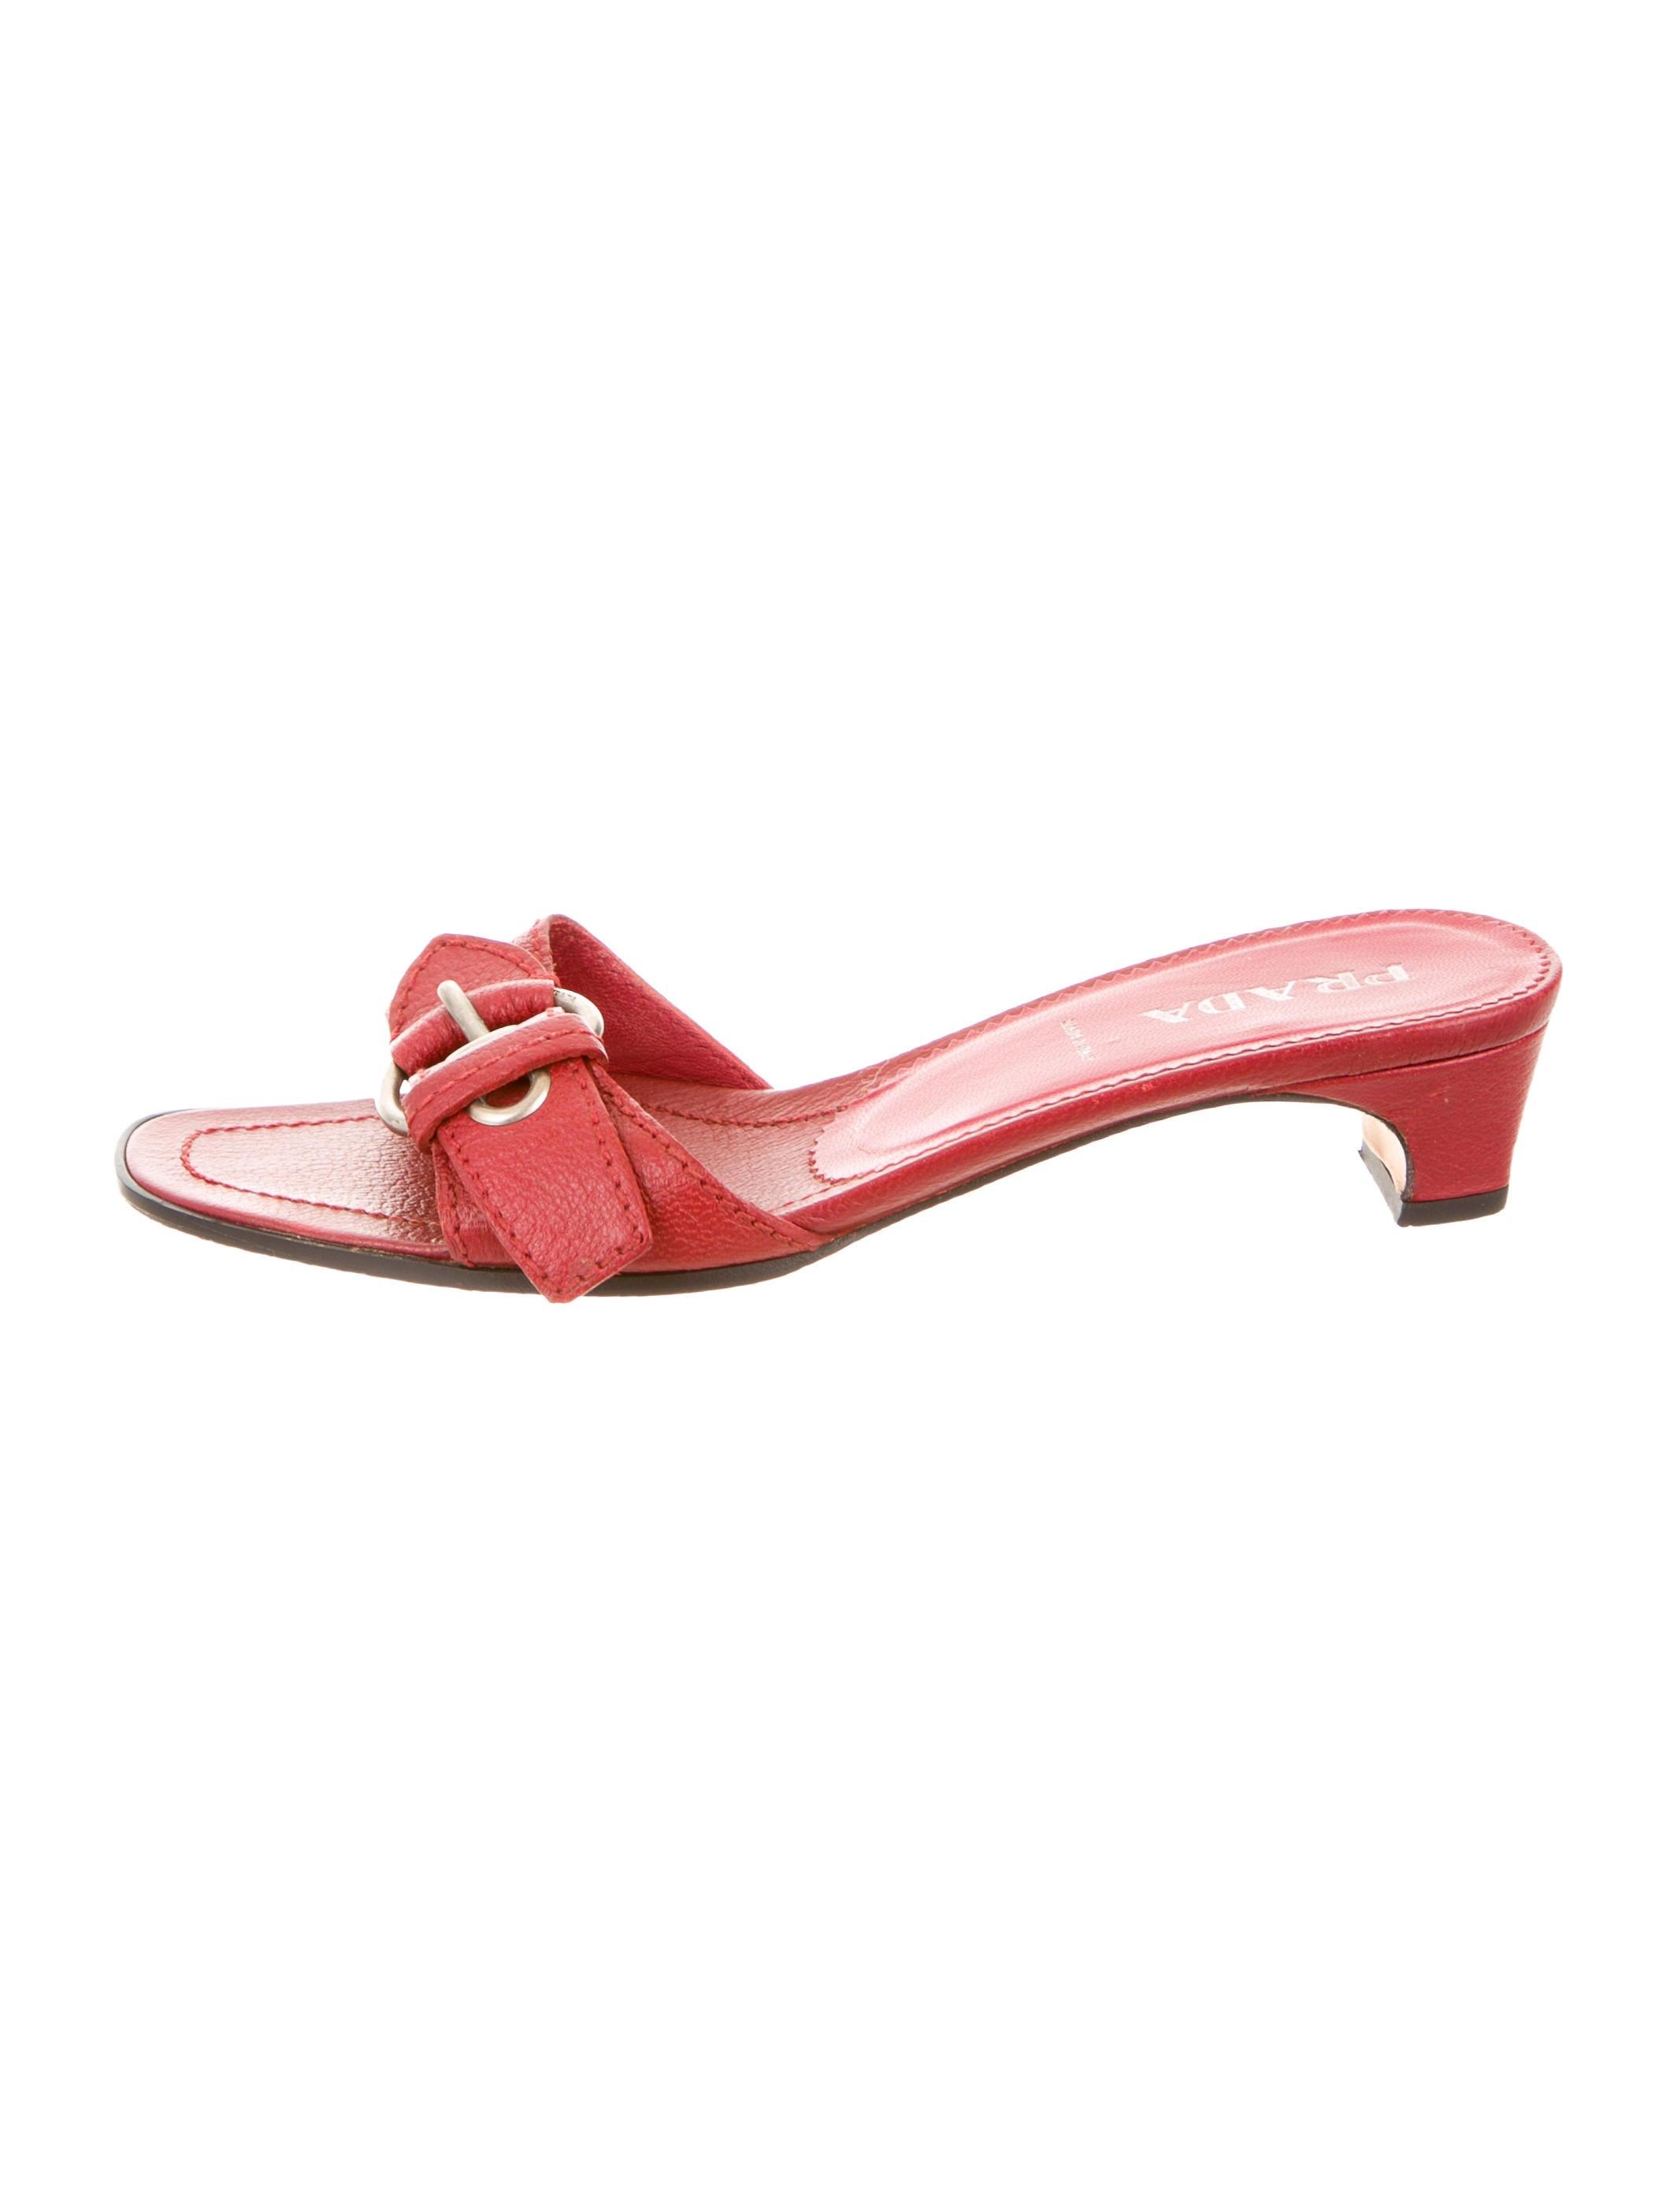 cheap price clearance online ebay Prada buckled slider sandals Qb8cj0ye